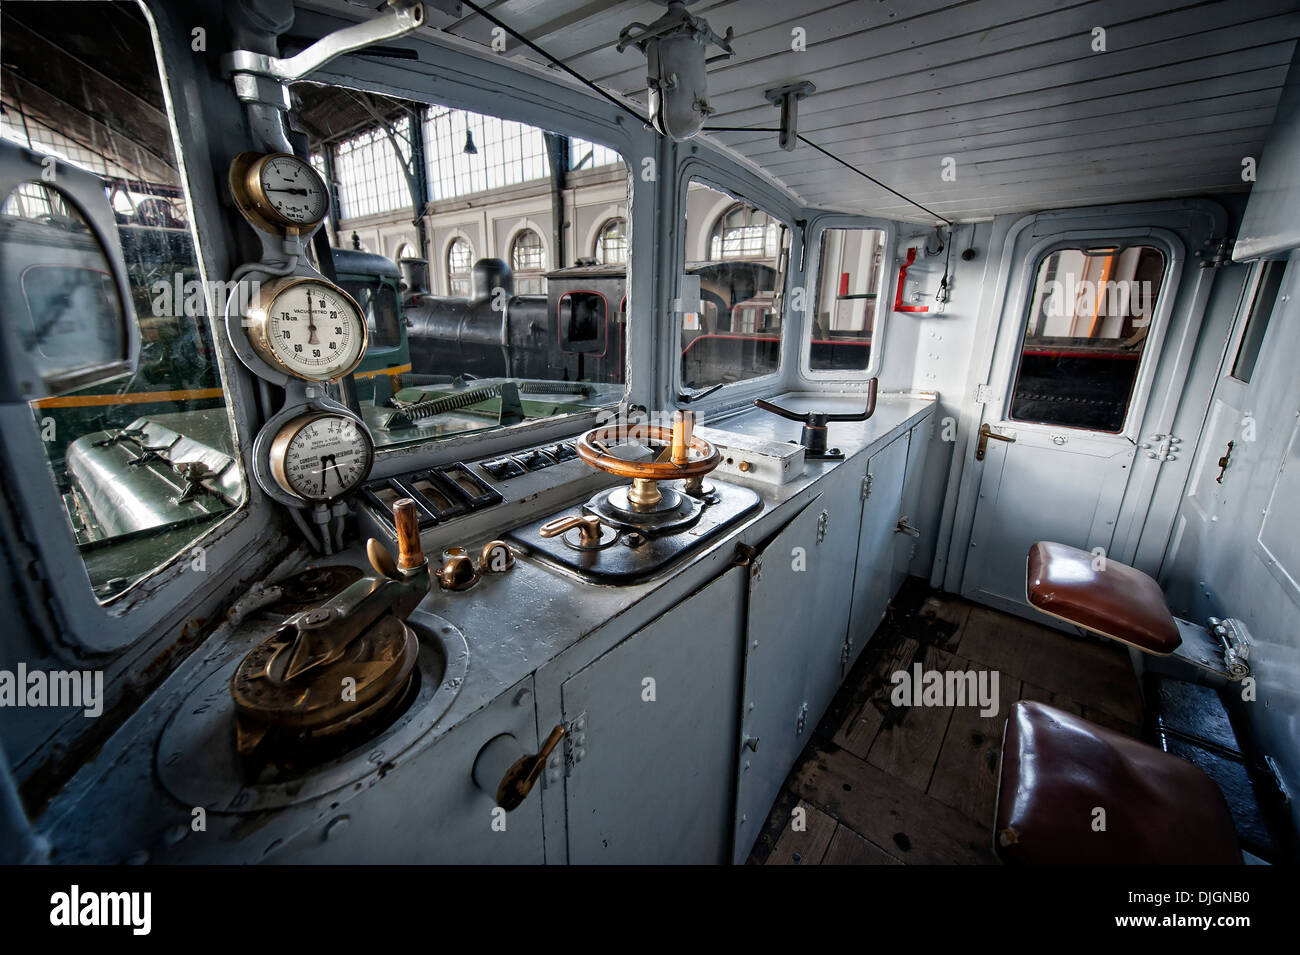 Electric locomotive train cockpit - Stock Image